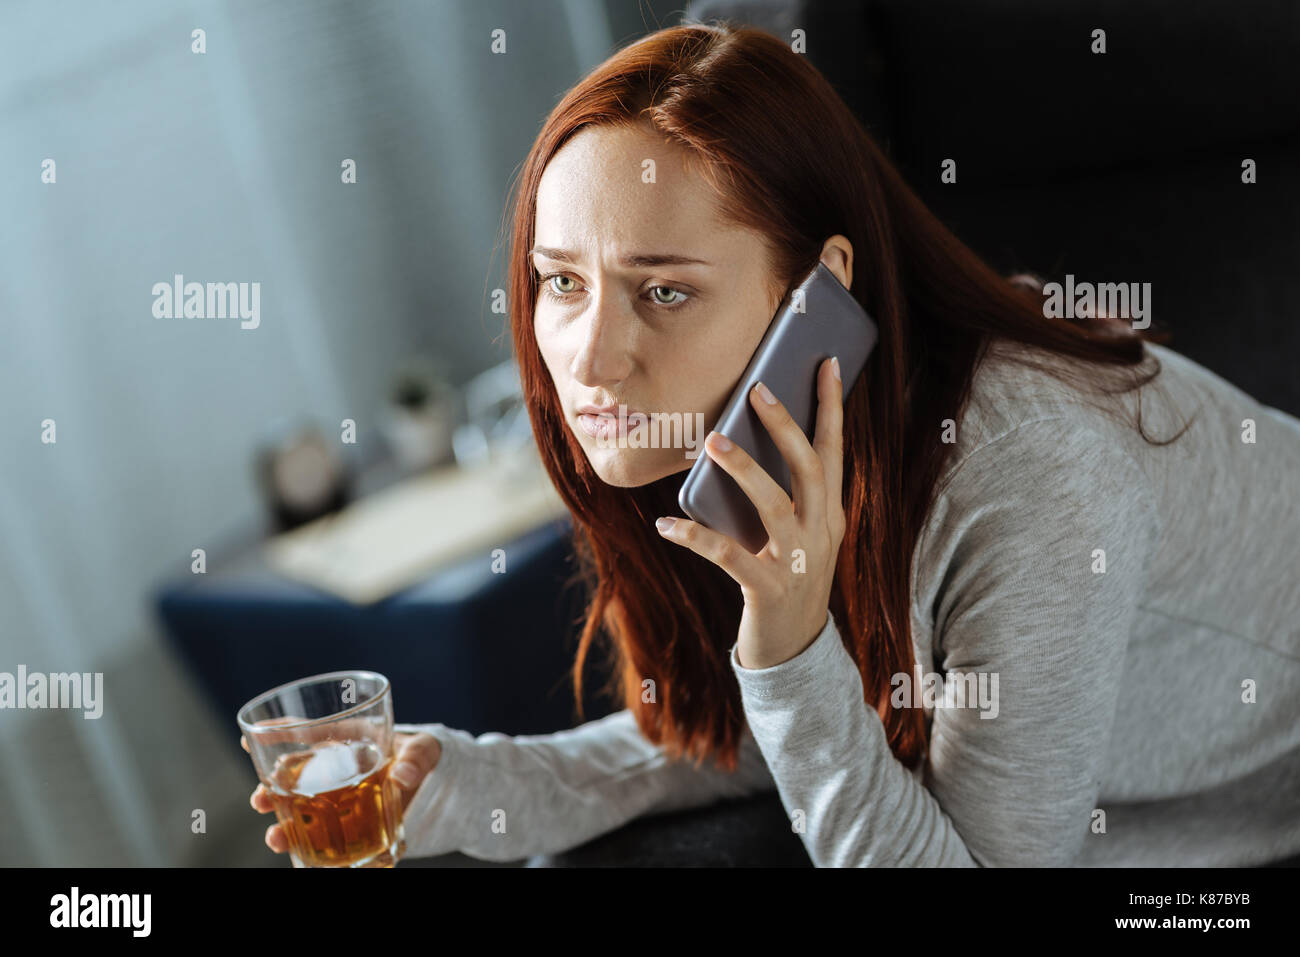 Cheerless gloomy woman making a call - Stock Image